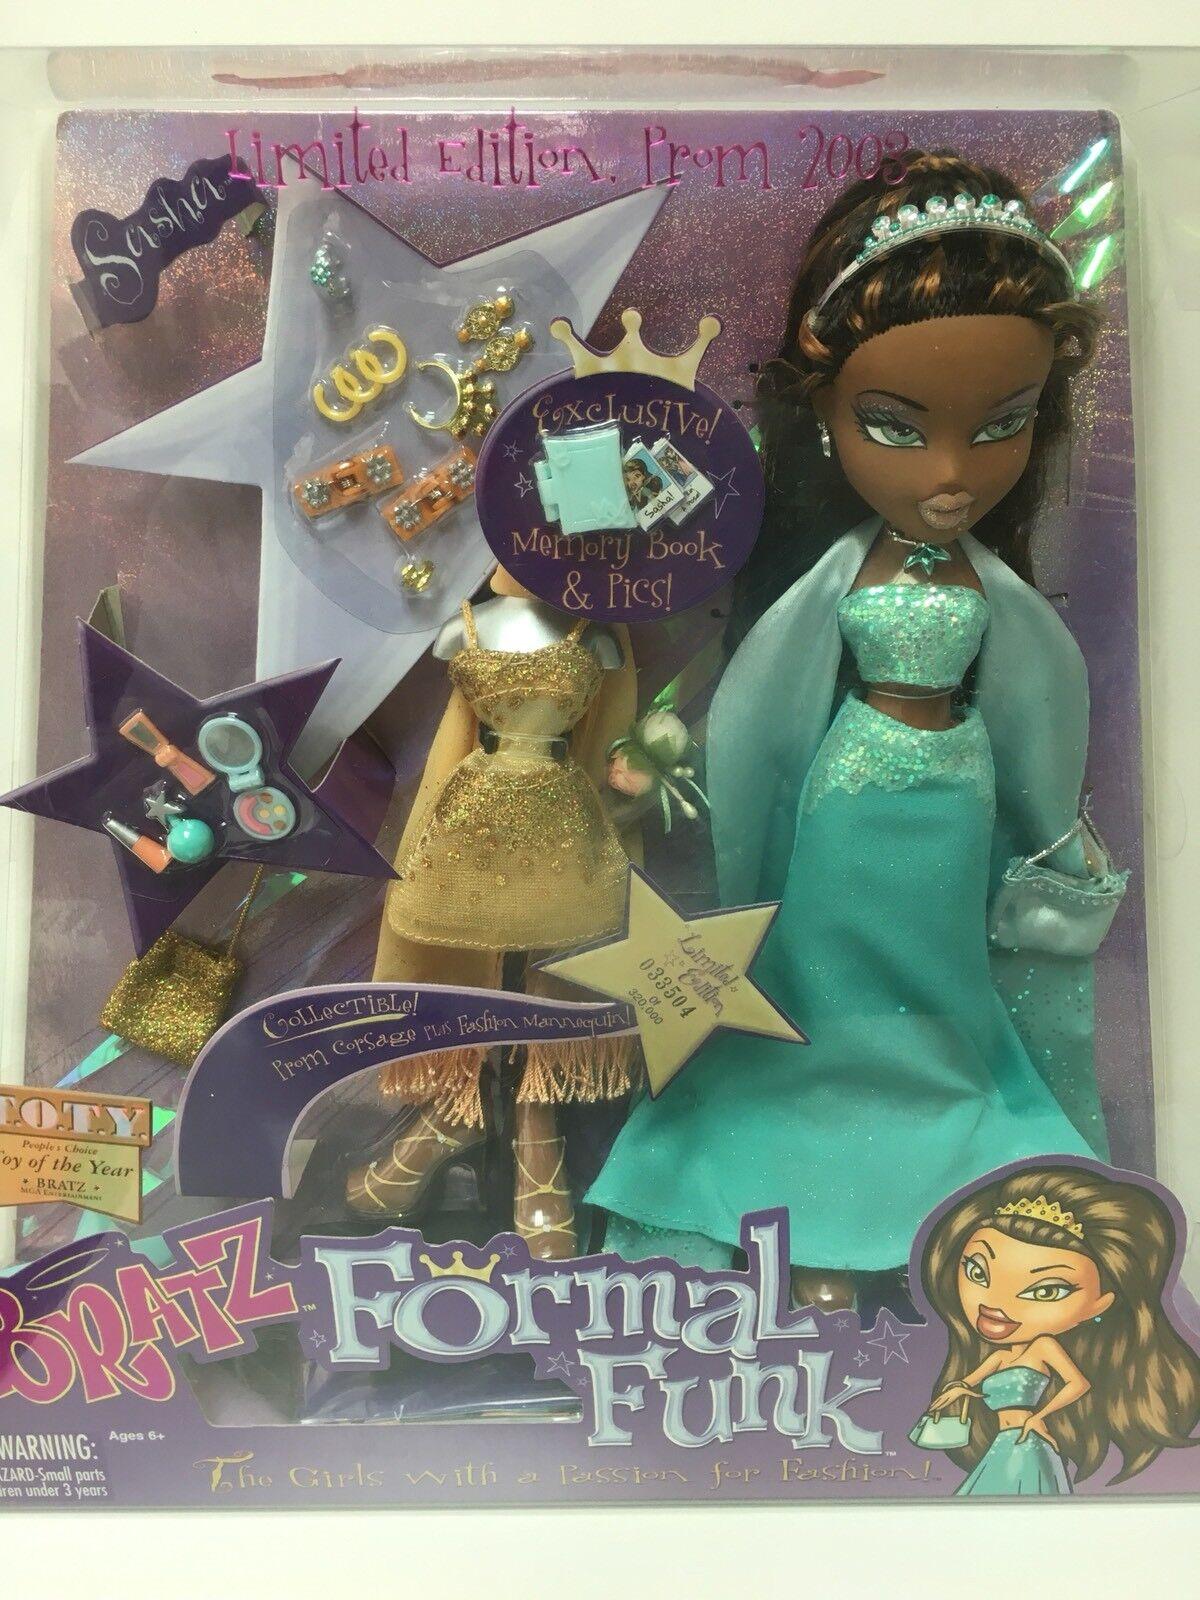 BRATZ-BRATZ SASHA Formale funk RARE-Limited Edition Doll da 2003 33504 32000